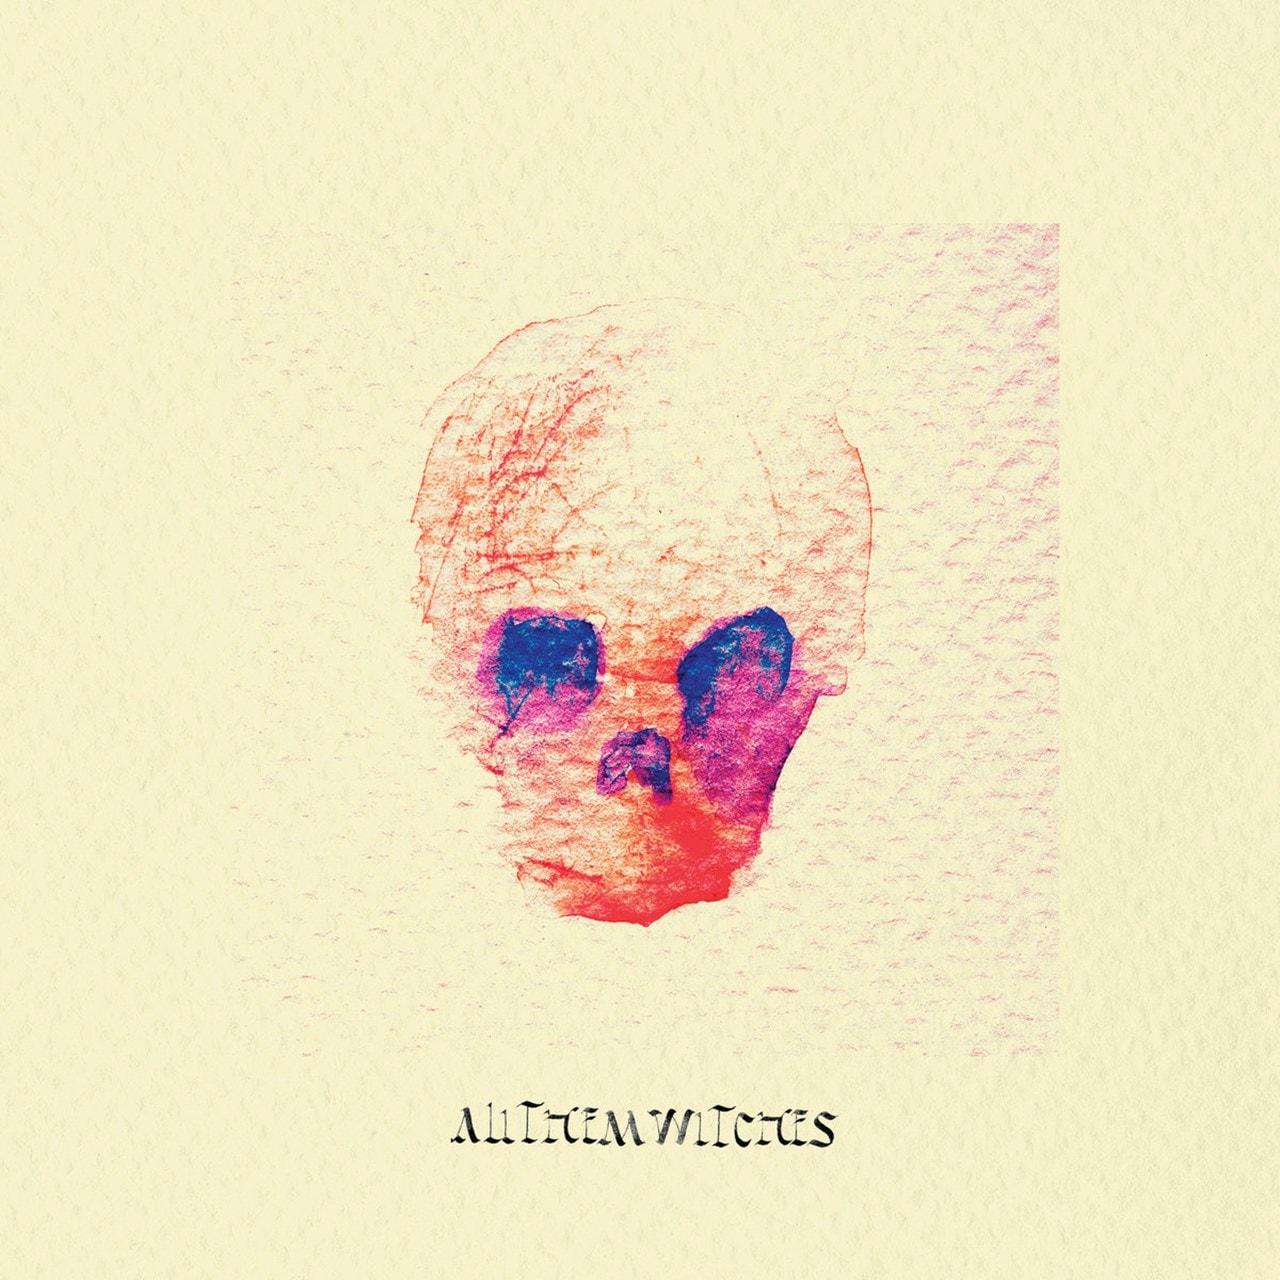 ATW - 1